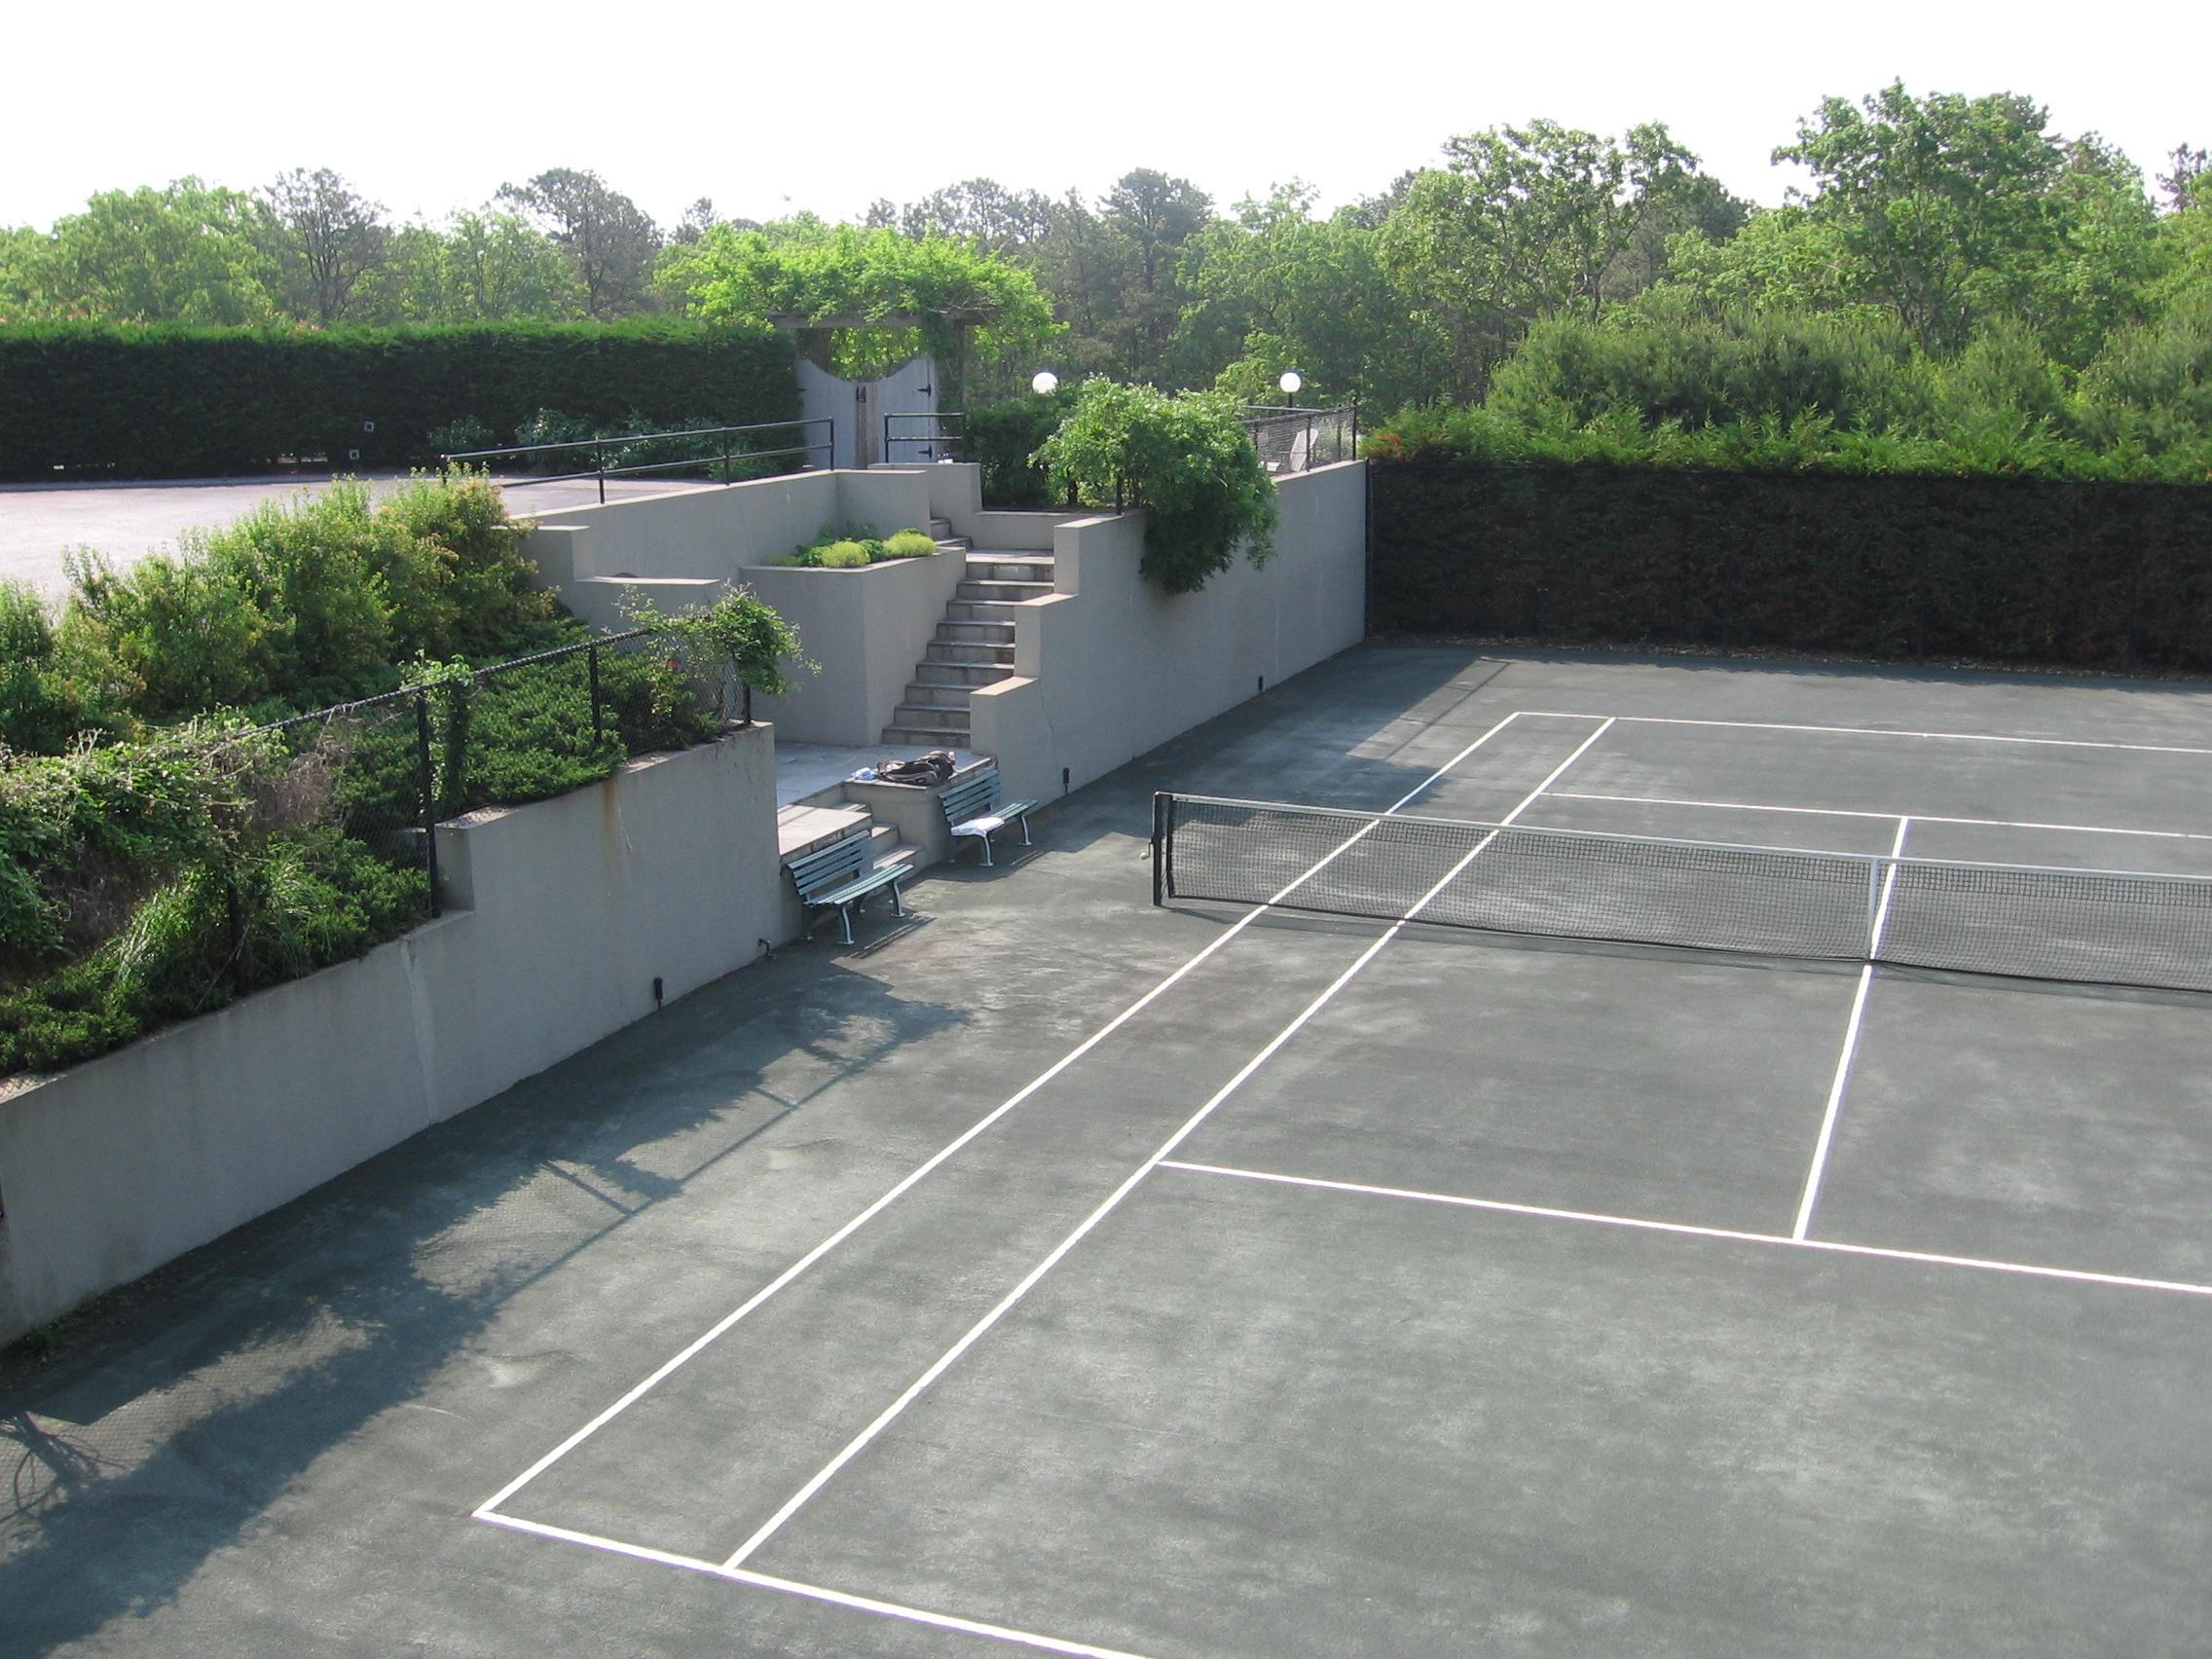 45 RCR Tennis Court.jpg